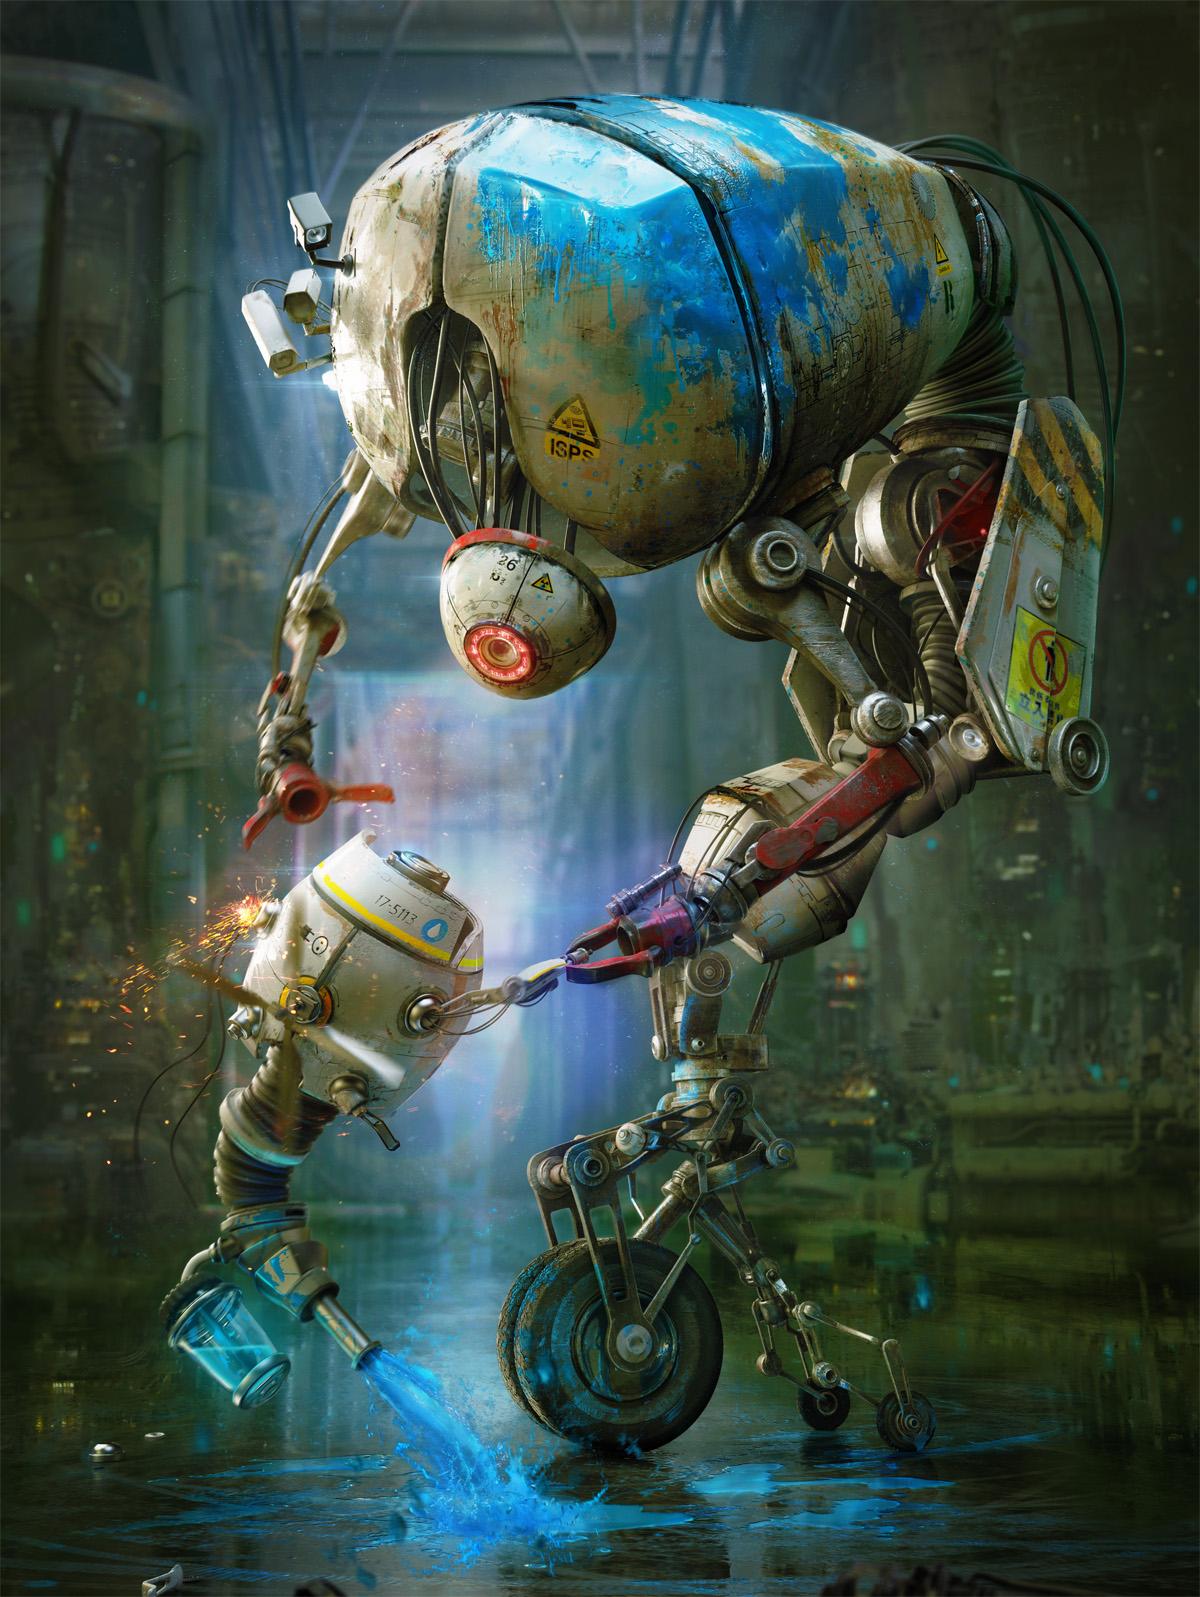 """Painting Robots"" by Gleb Alexandrov"